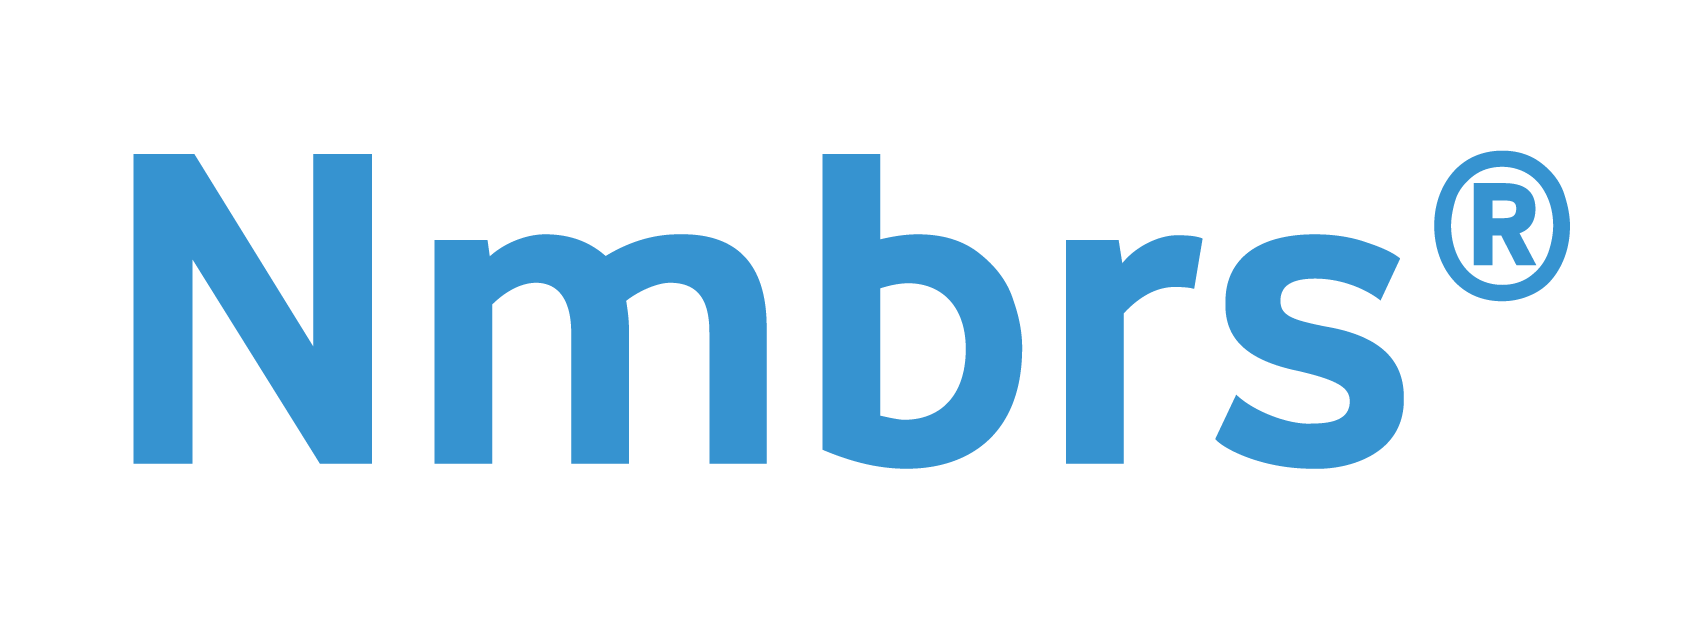 nmbrs_logo_blue